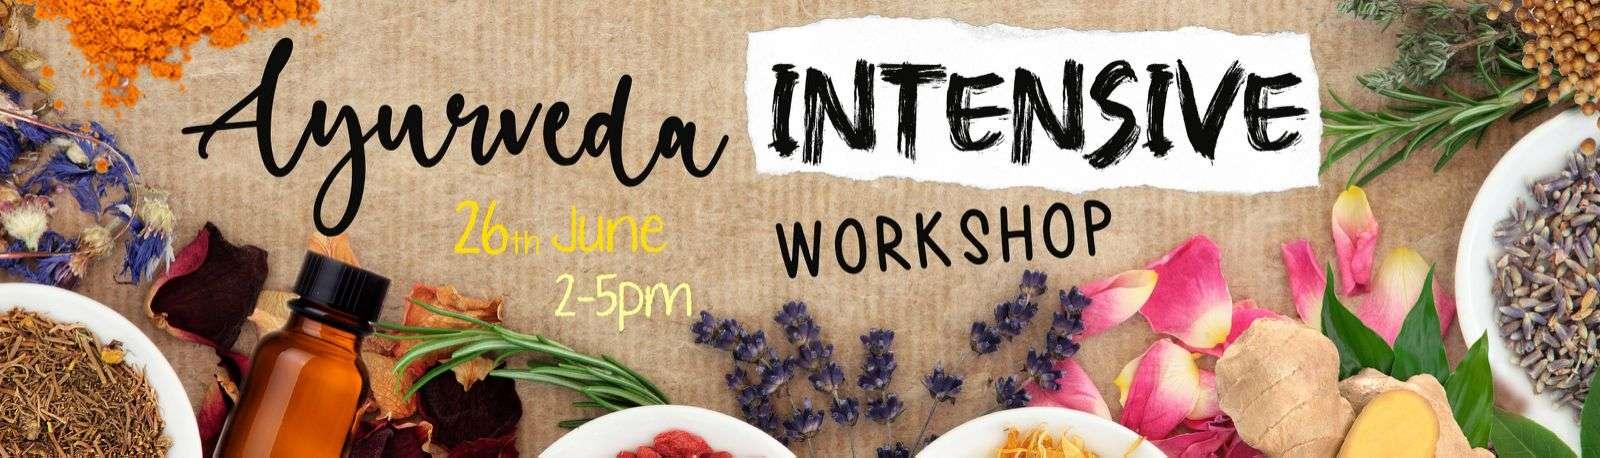 ayurveda intensive workshop